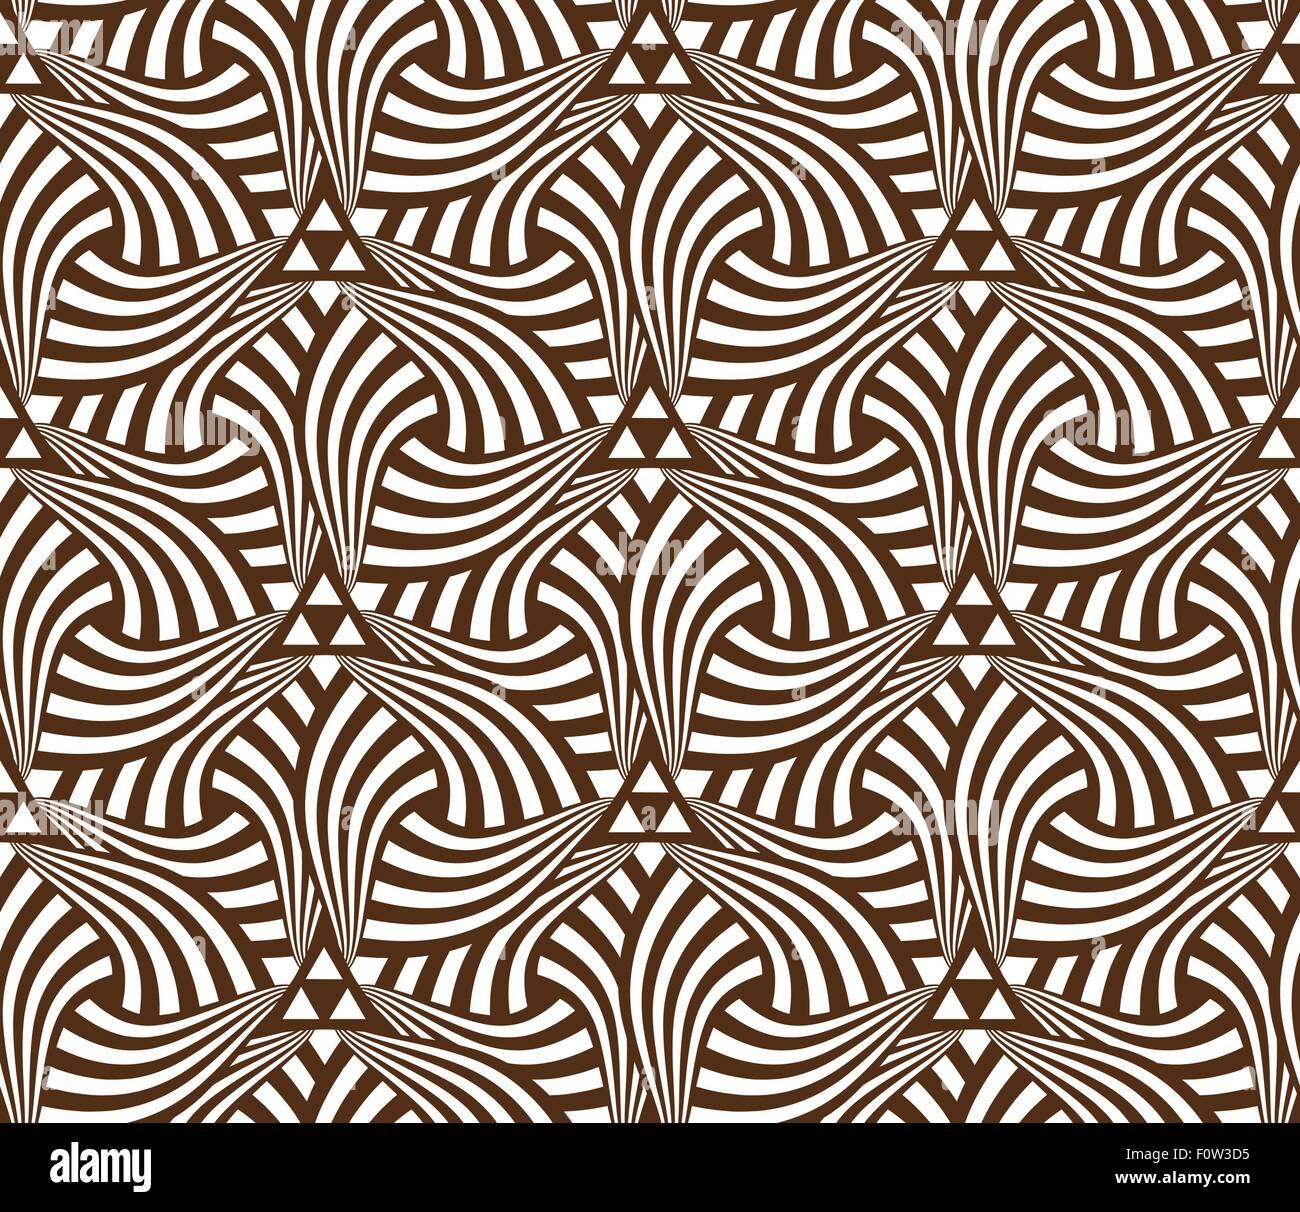 Geometric Abstract Seamless Pattern Motif Background